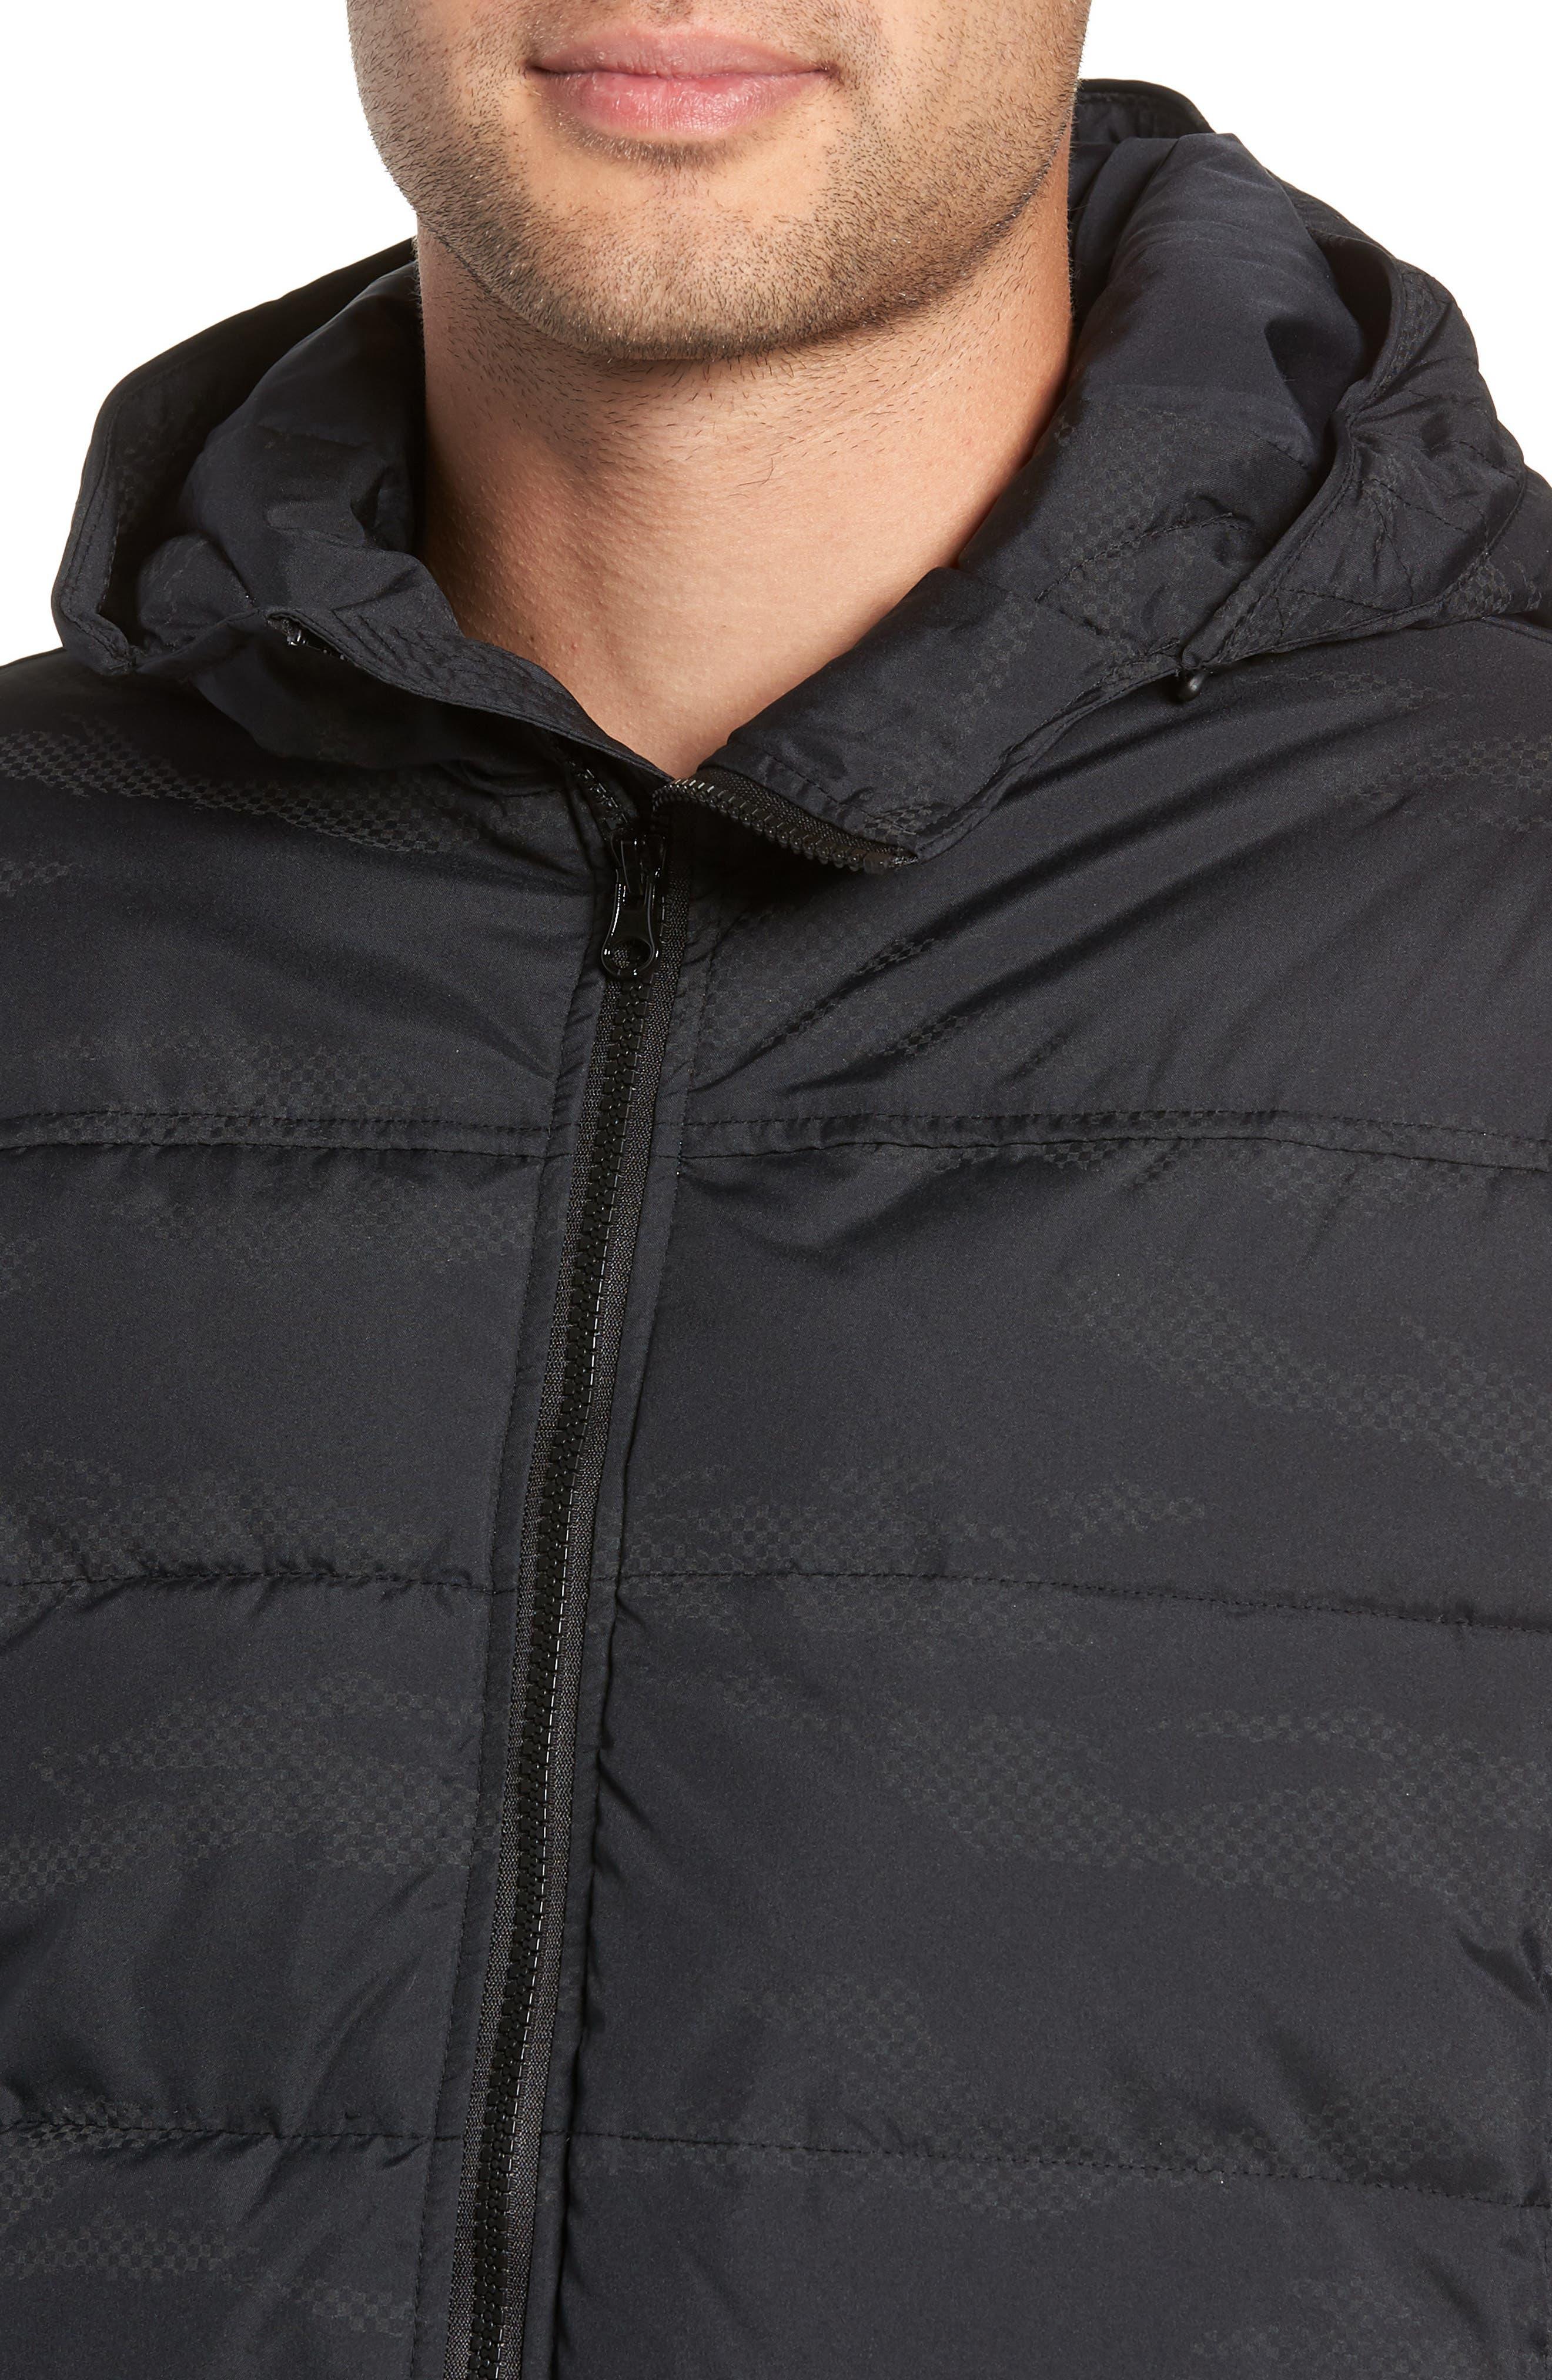 Woodcrest MTE Jacket,                             Alternate thumbnail 4, color,                             BLACK REFLECTIVE